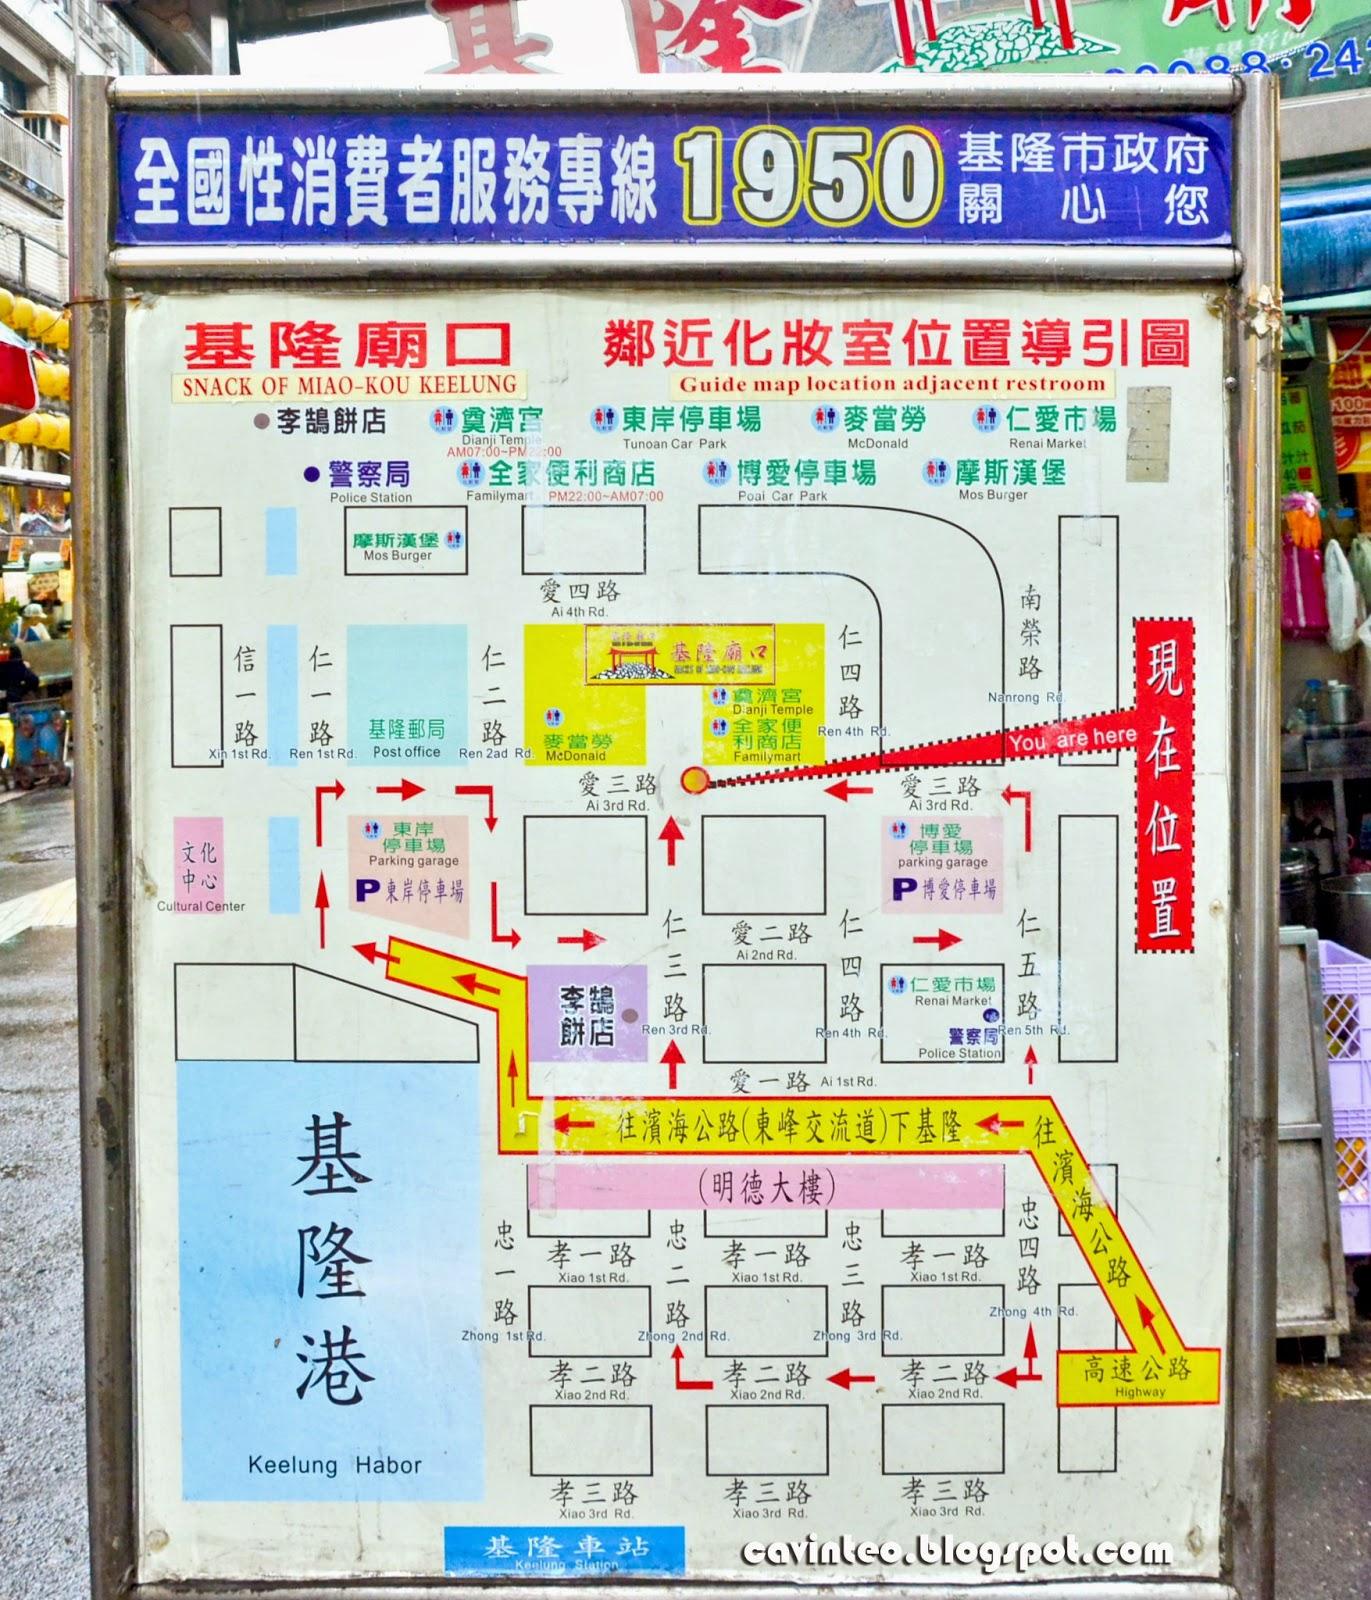 Nicest Places To Eat Near Me: Entree Kibbles: Keelung Miaokou Night Market (基隆廟口夜市